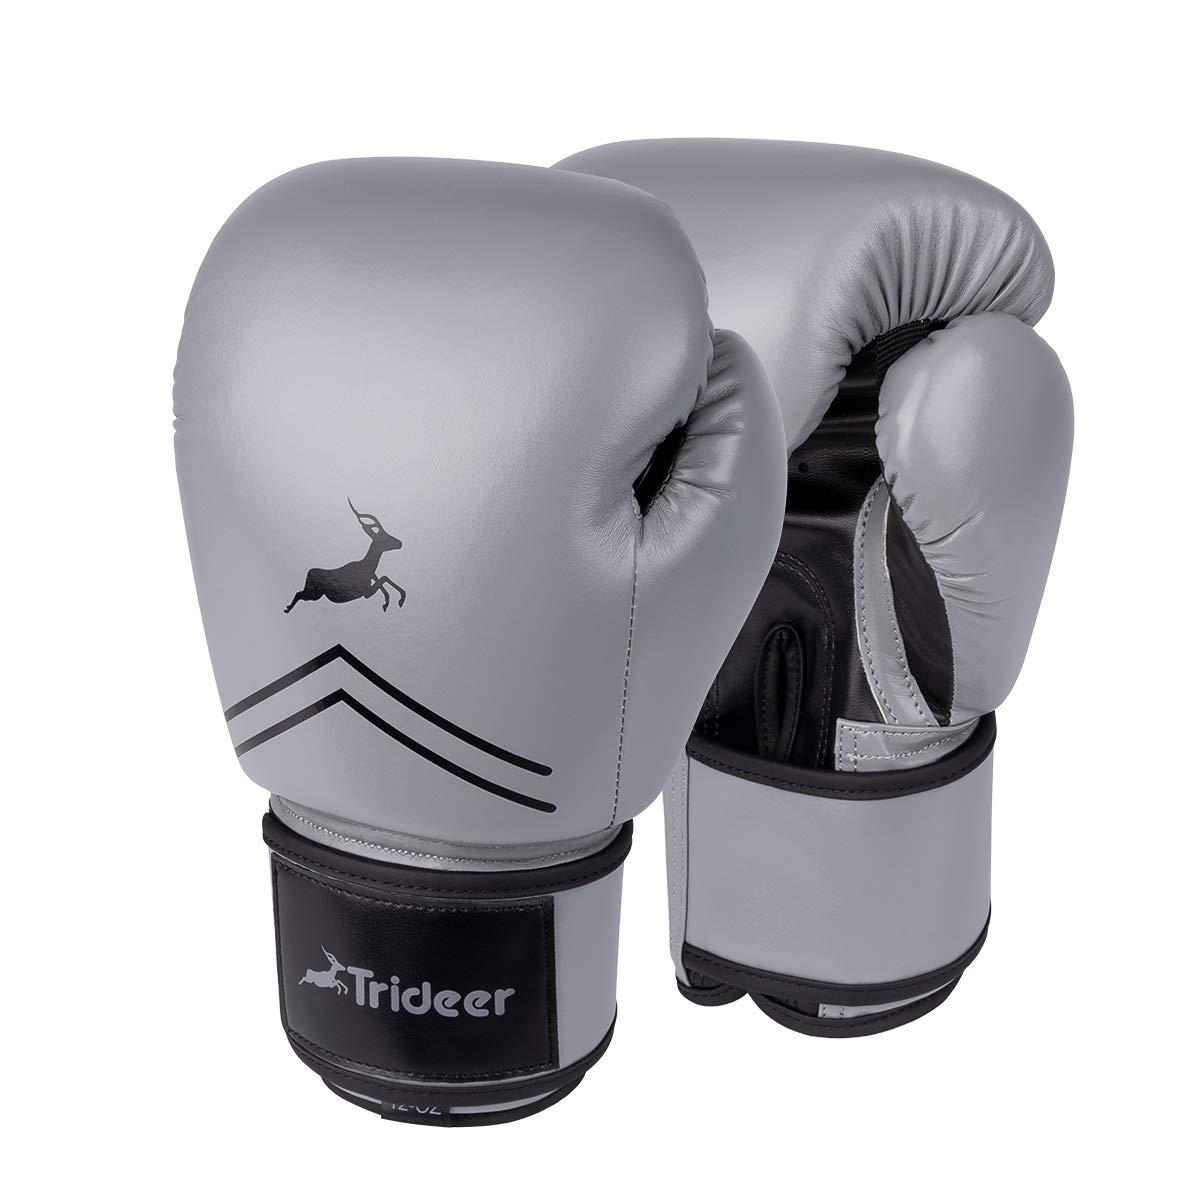 Trideer Pro Grade Boxing Gloves, Kickboxing Bagwork